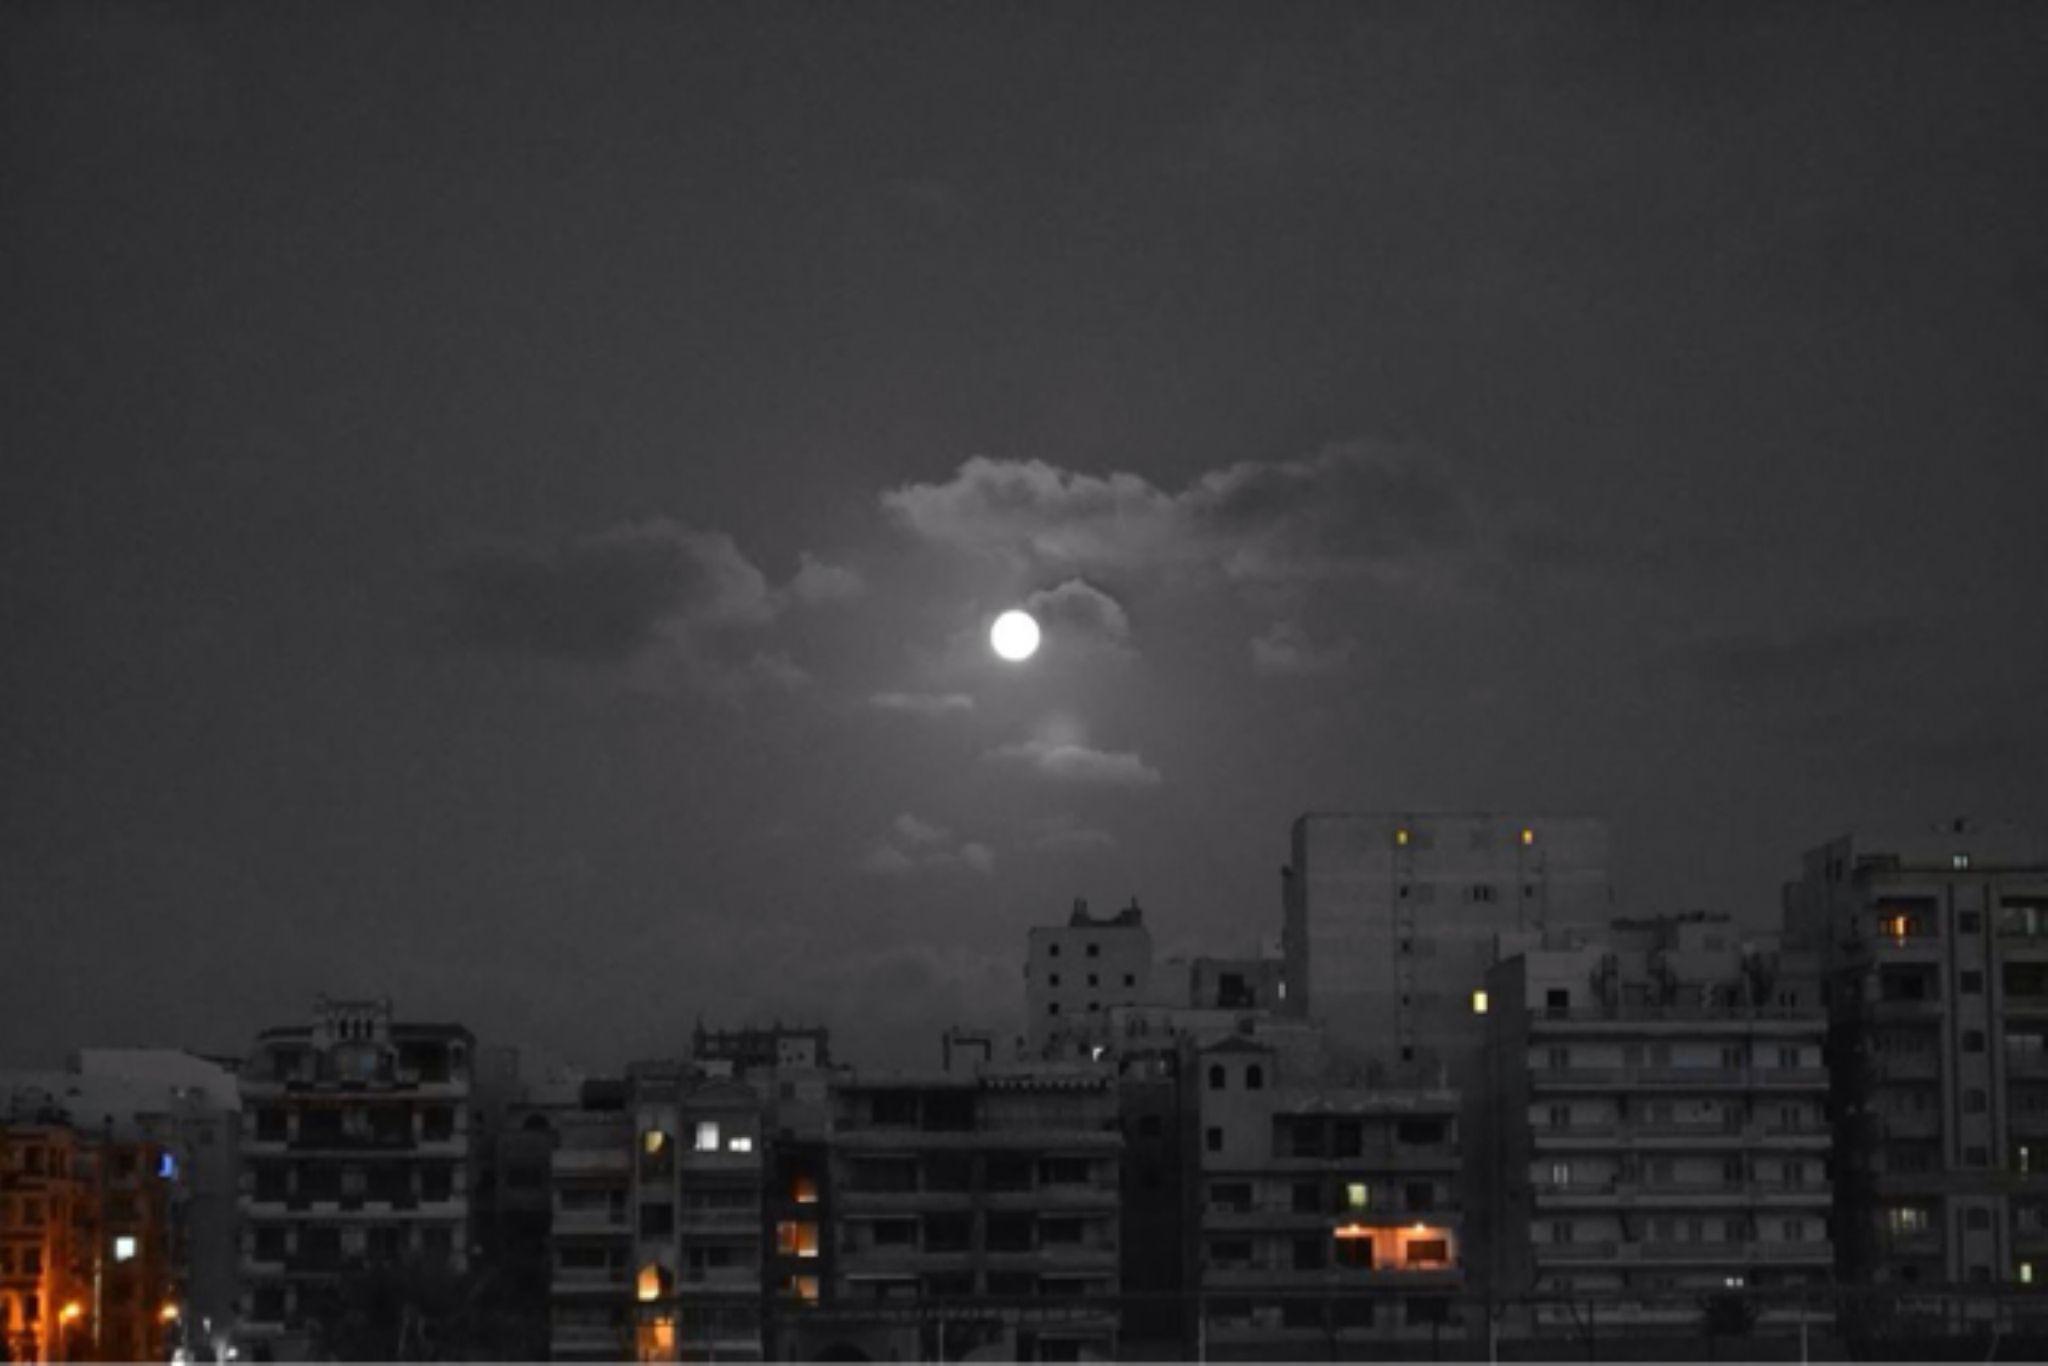 IMG_0162 by Abdelrahman Magdy